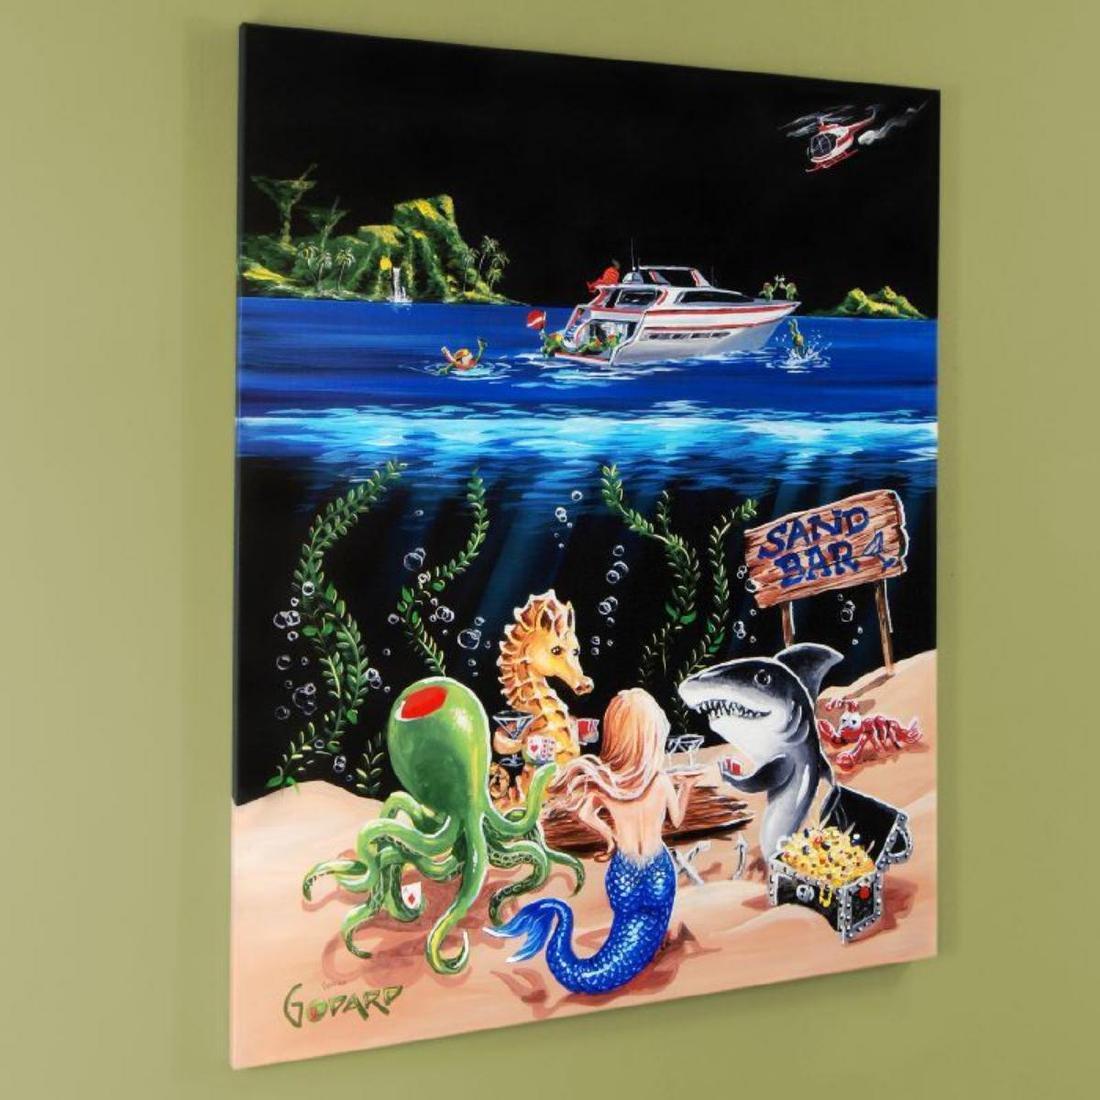 """Sand Bar 1"" Mural LIMITED EDITION Hand-Embellished - 3"